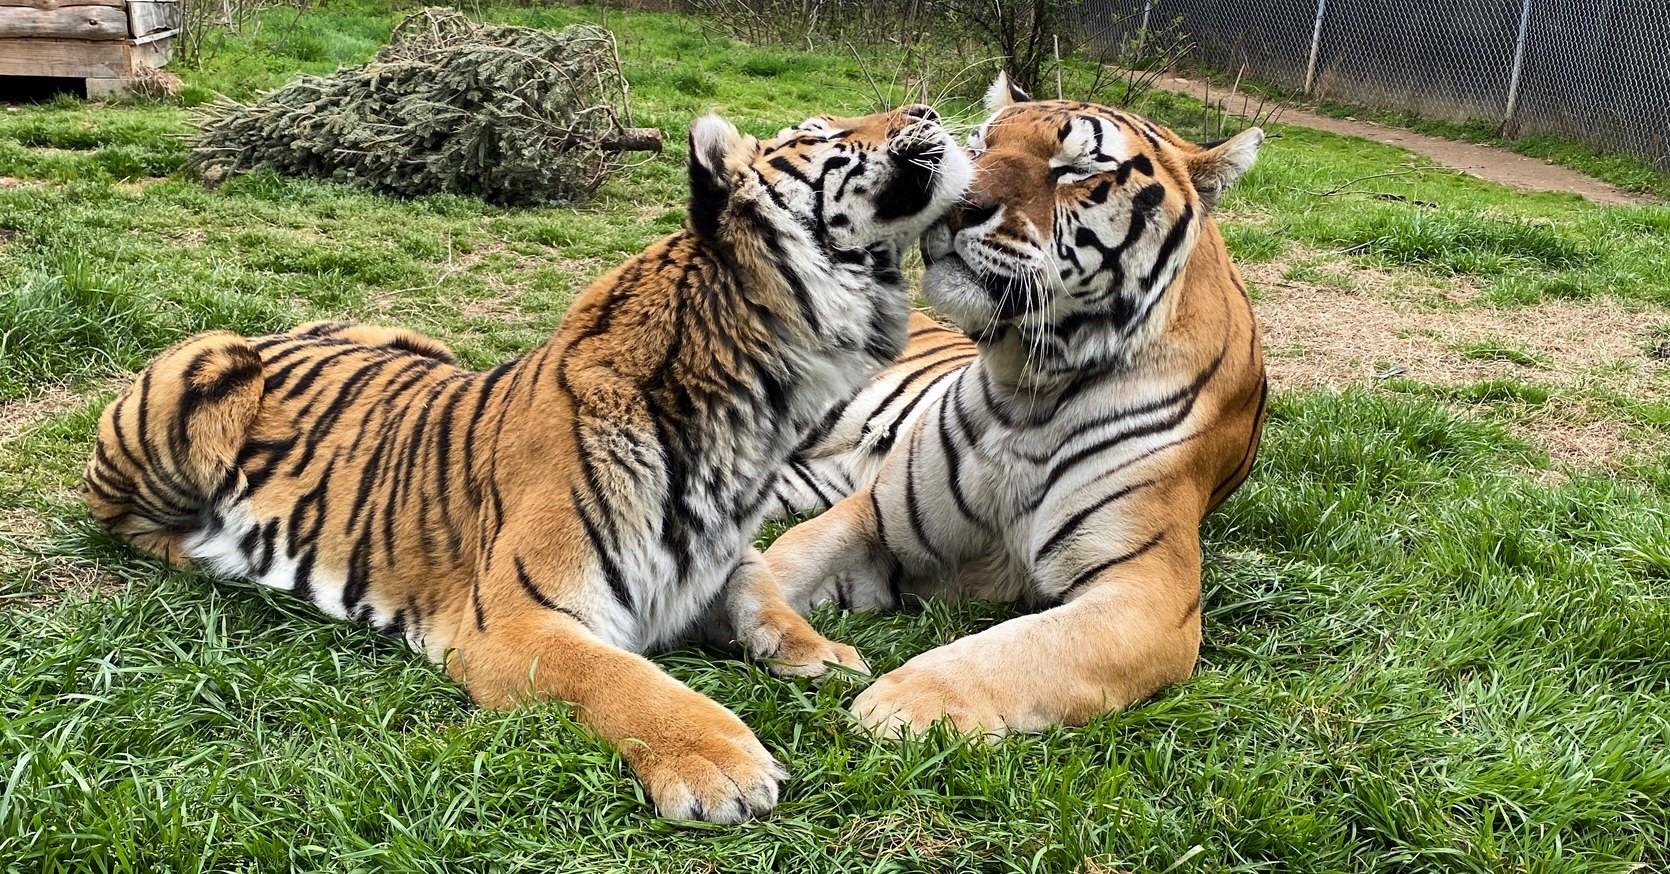 Get social with Carolina Tiger Rescue!